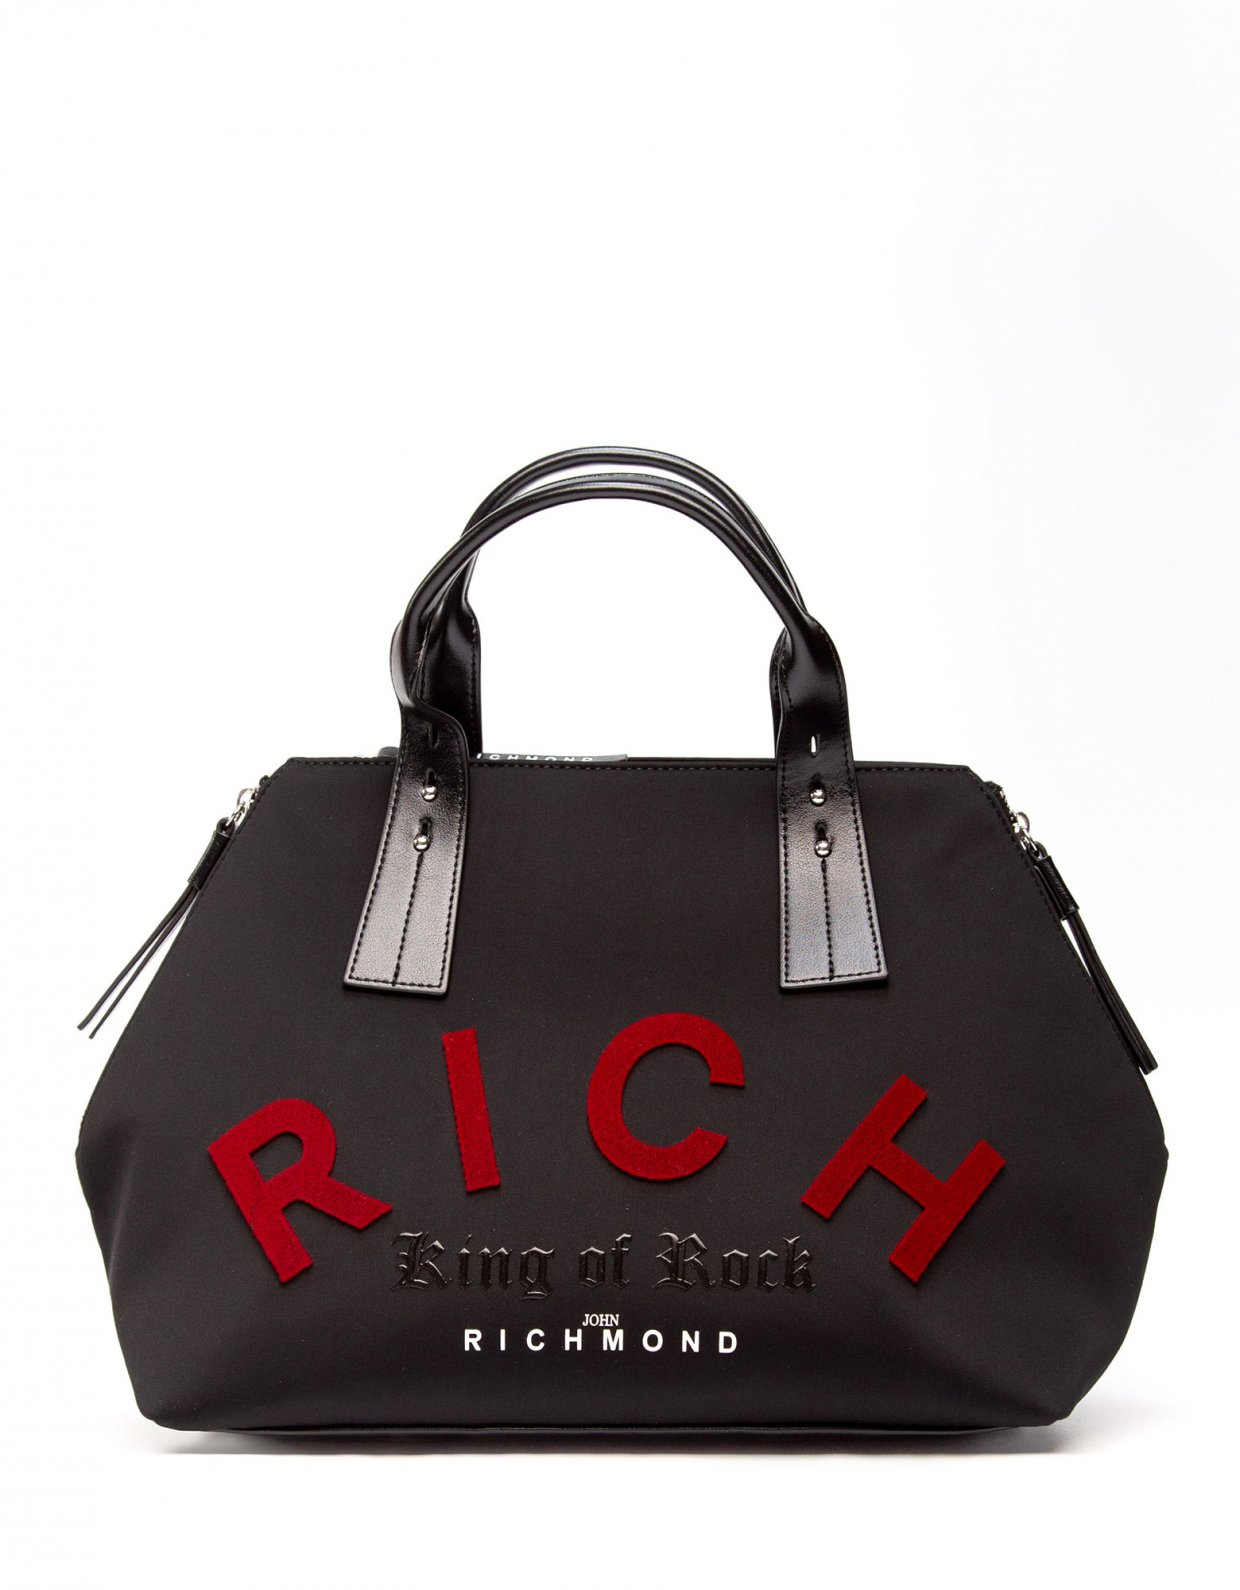 John Richmond Trunk bag Croag